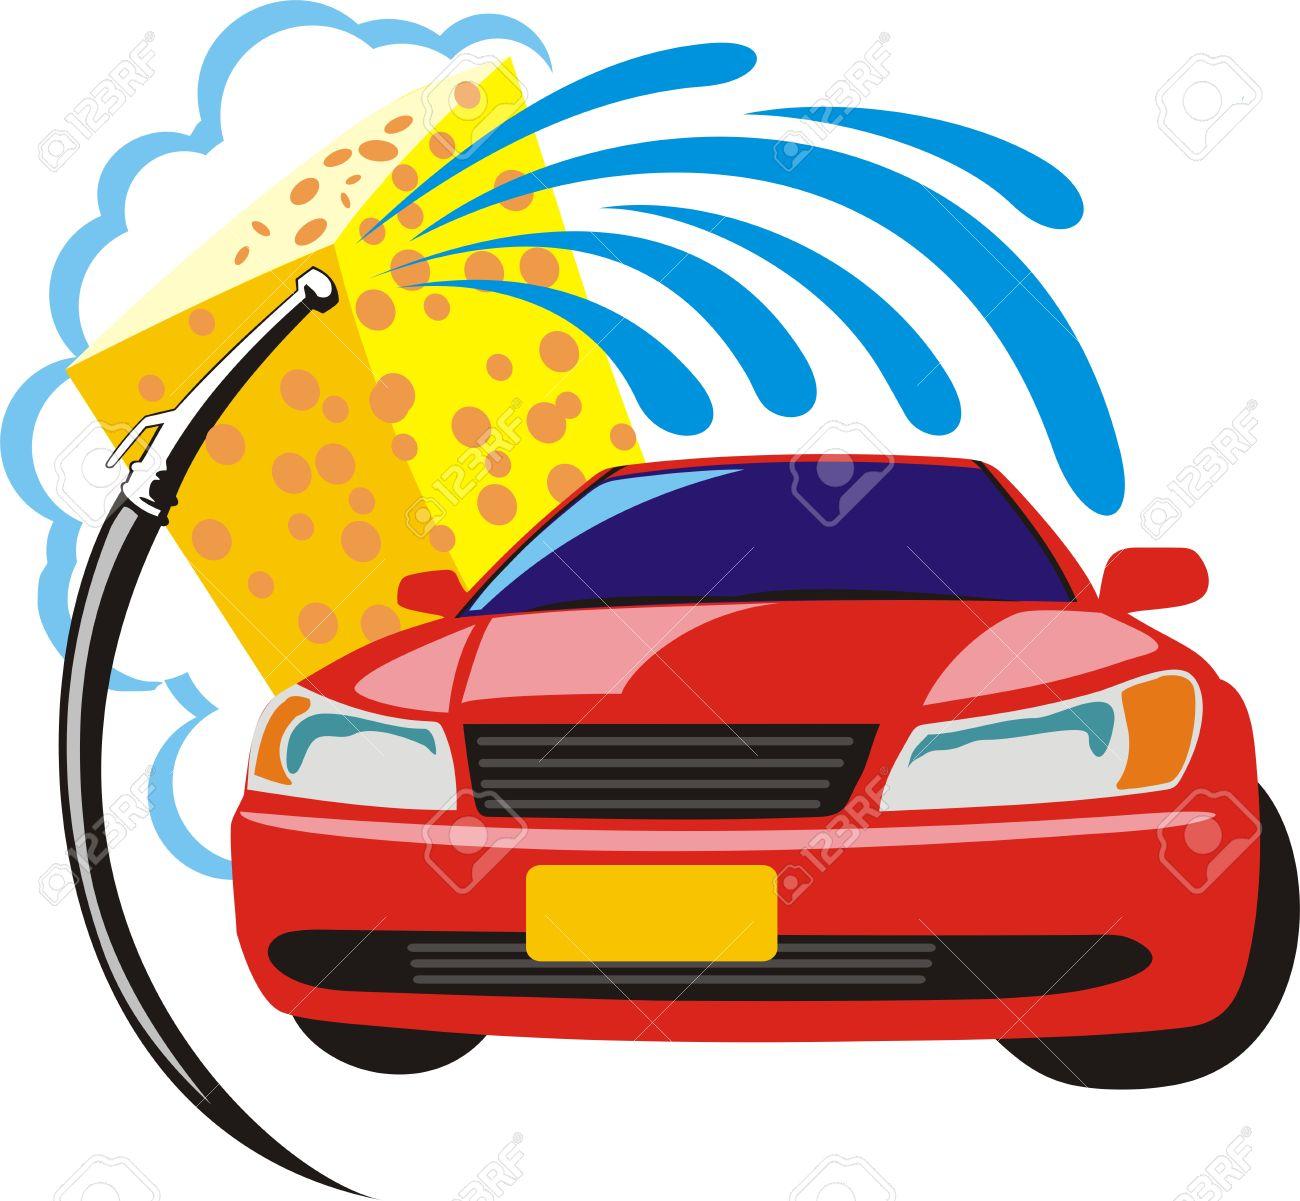 car wash sign royalty free cliparts vectors and stock illustration rh 123rf com car wash victoria bc car wash victorville